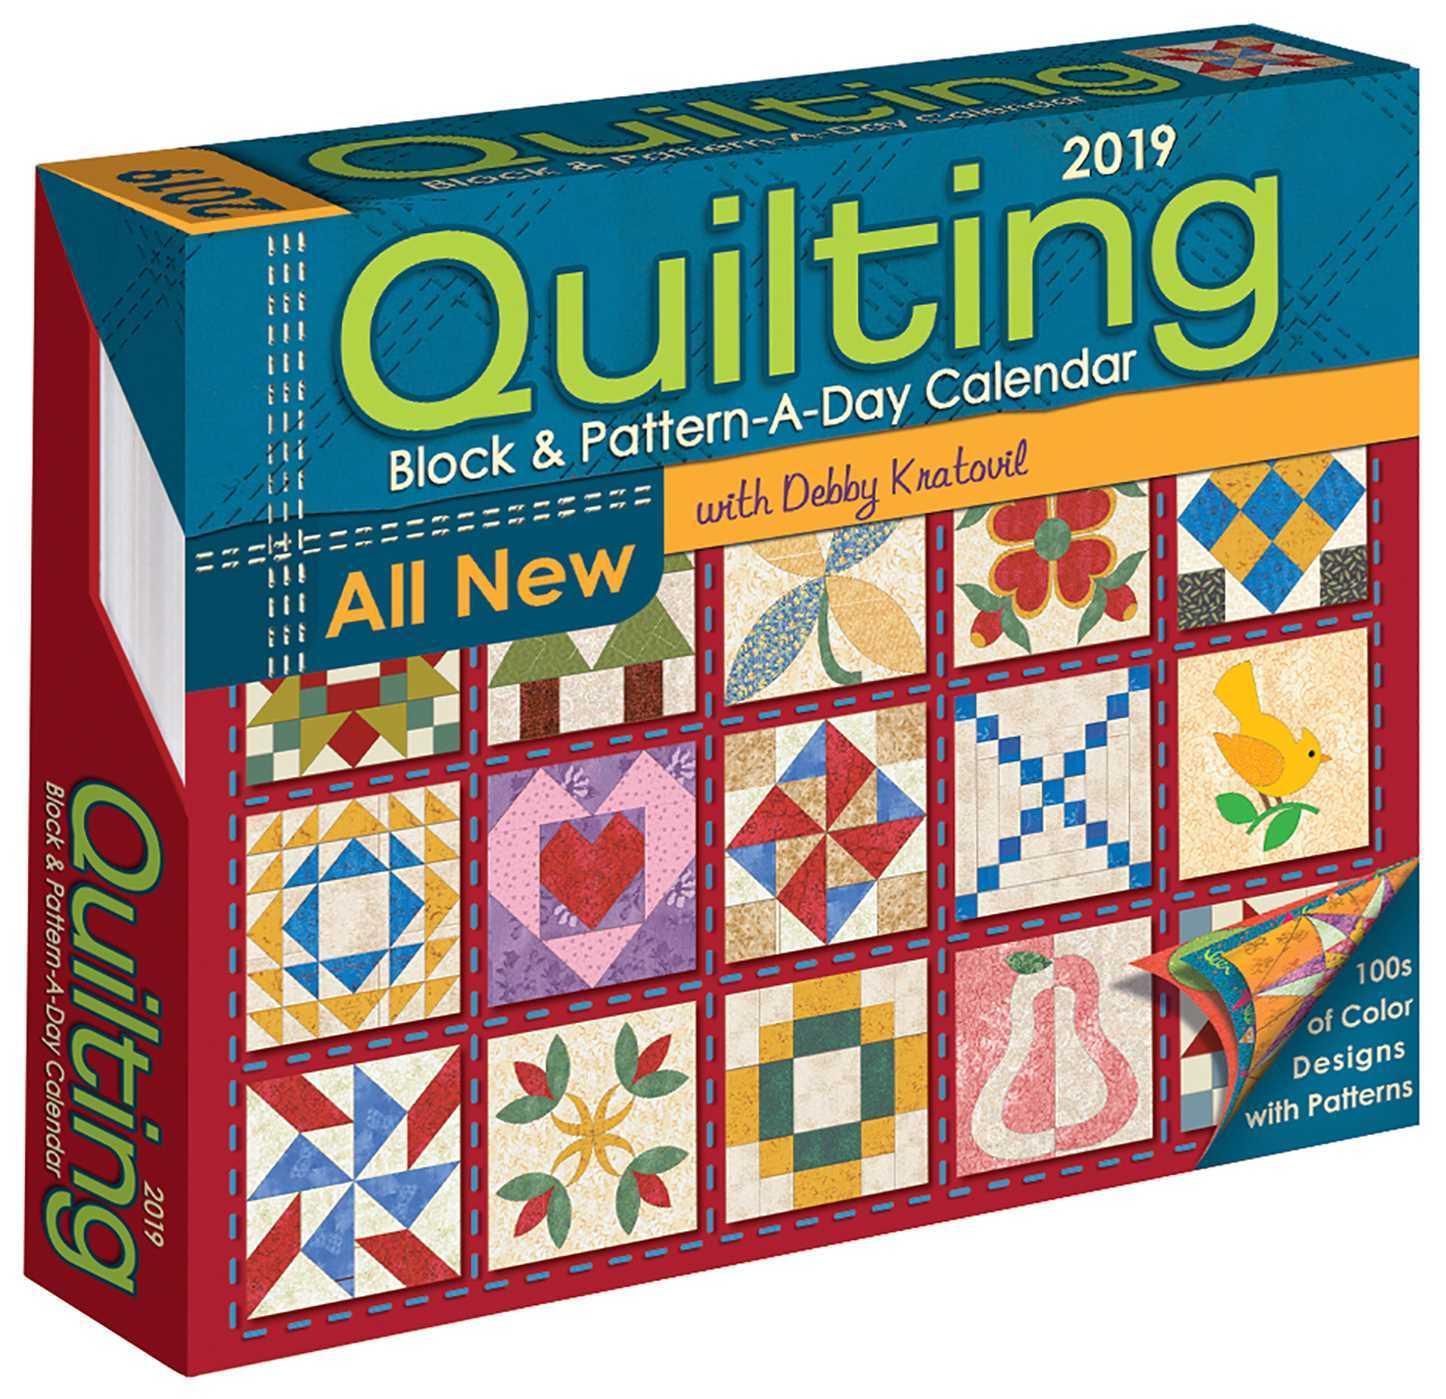 Quilting Block  Pattern-a-Day 2019 Calendar